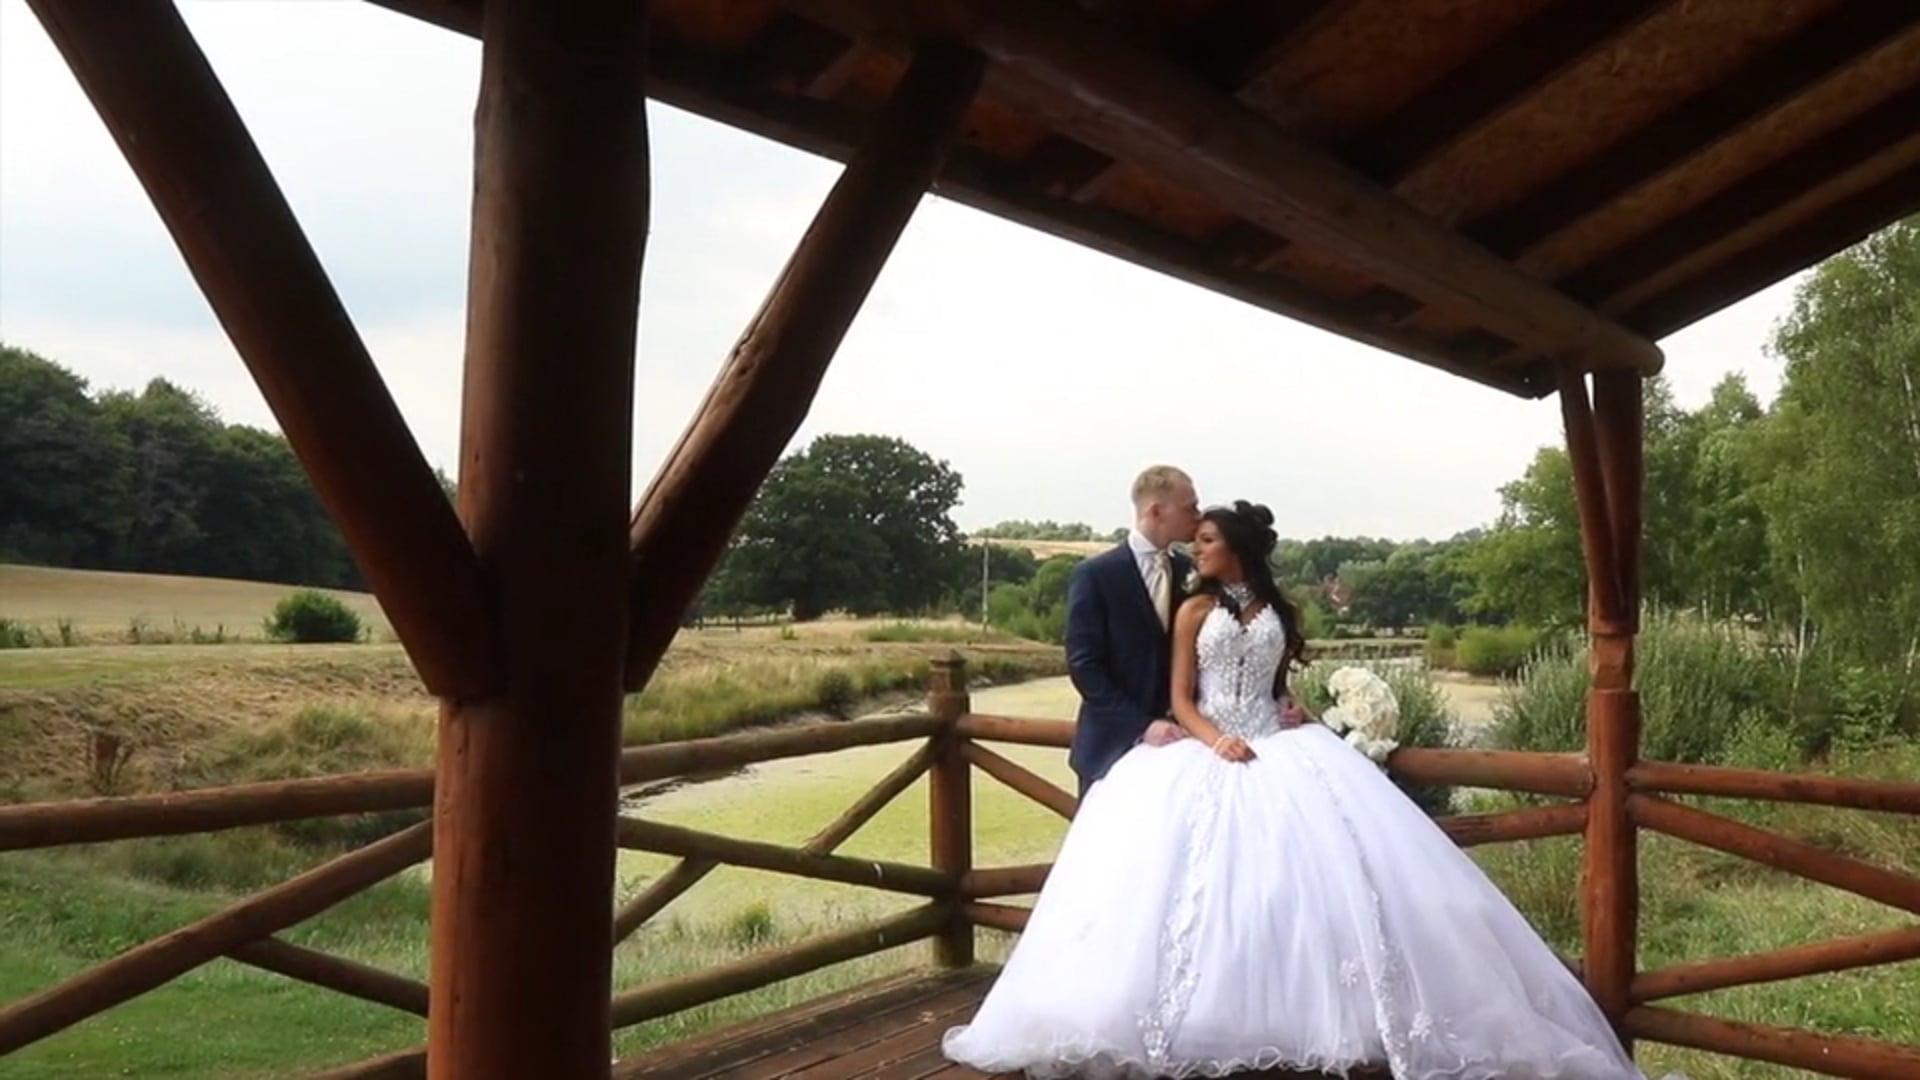 Laura & Ashley's Wedding Movie, East Horton Golf Centre, 21st July 2018